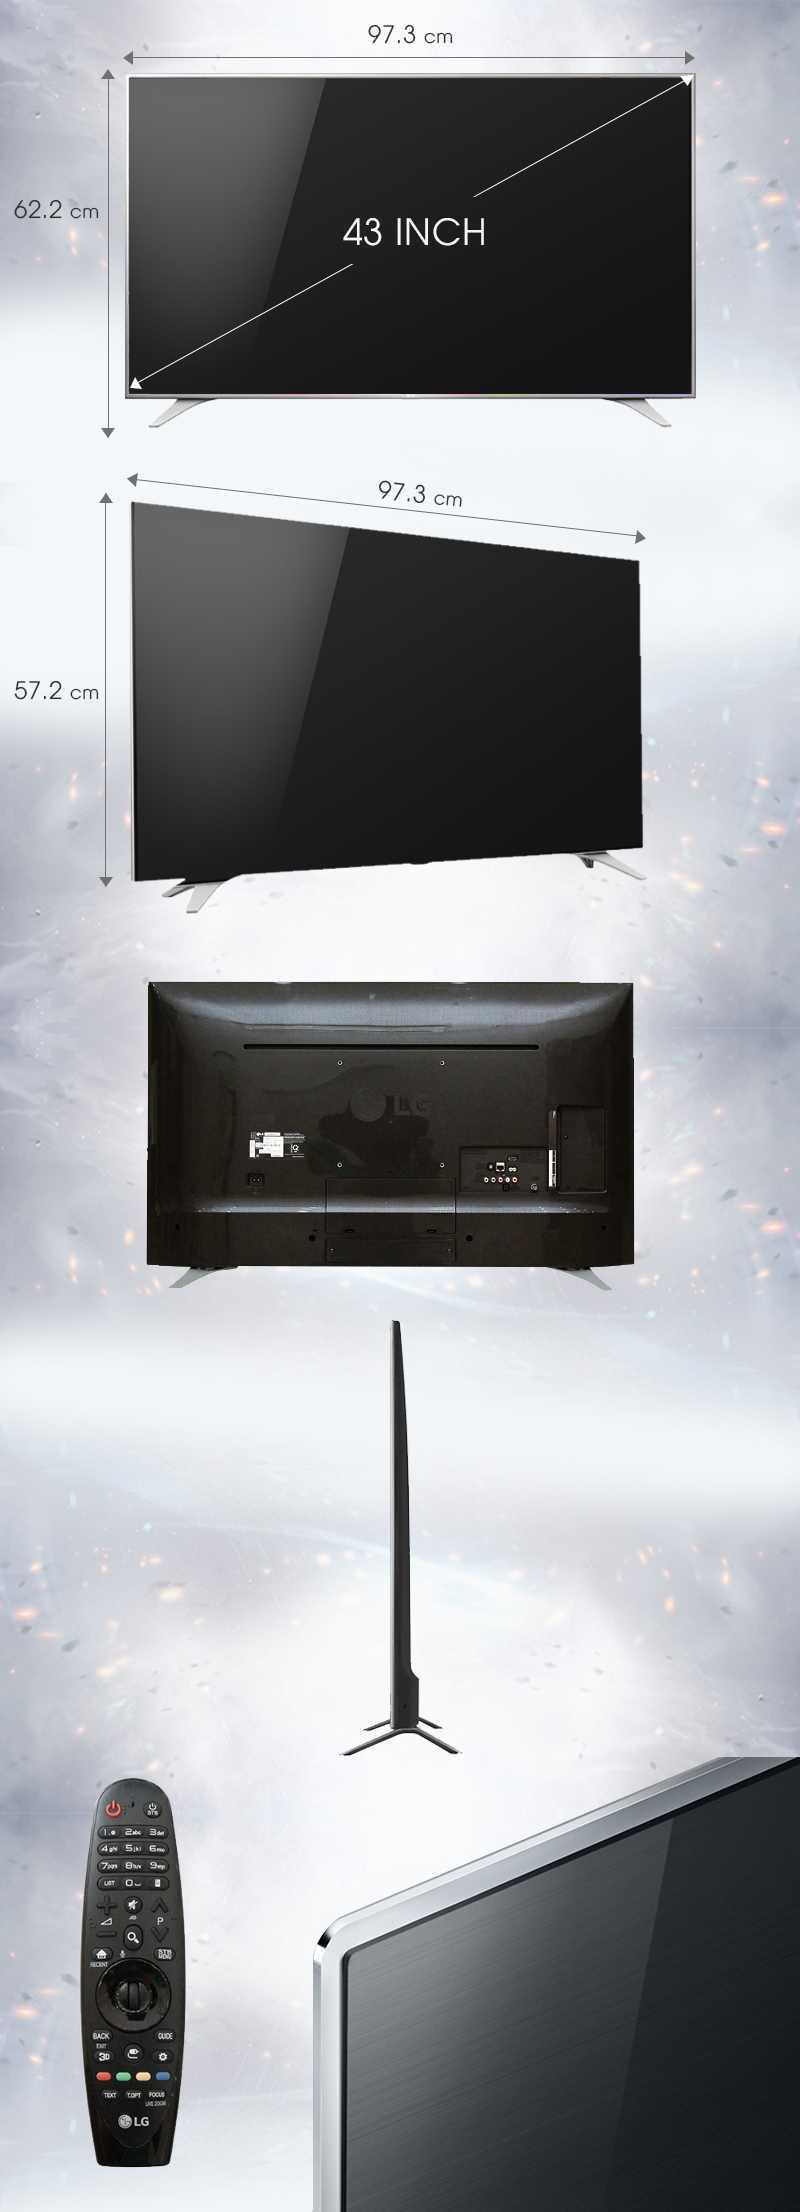 Smart Tivi LG 43 inch 43UH650T